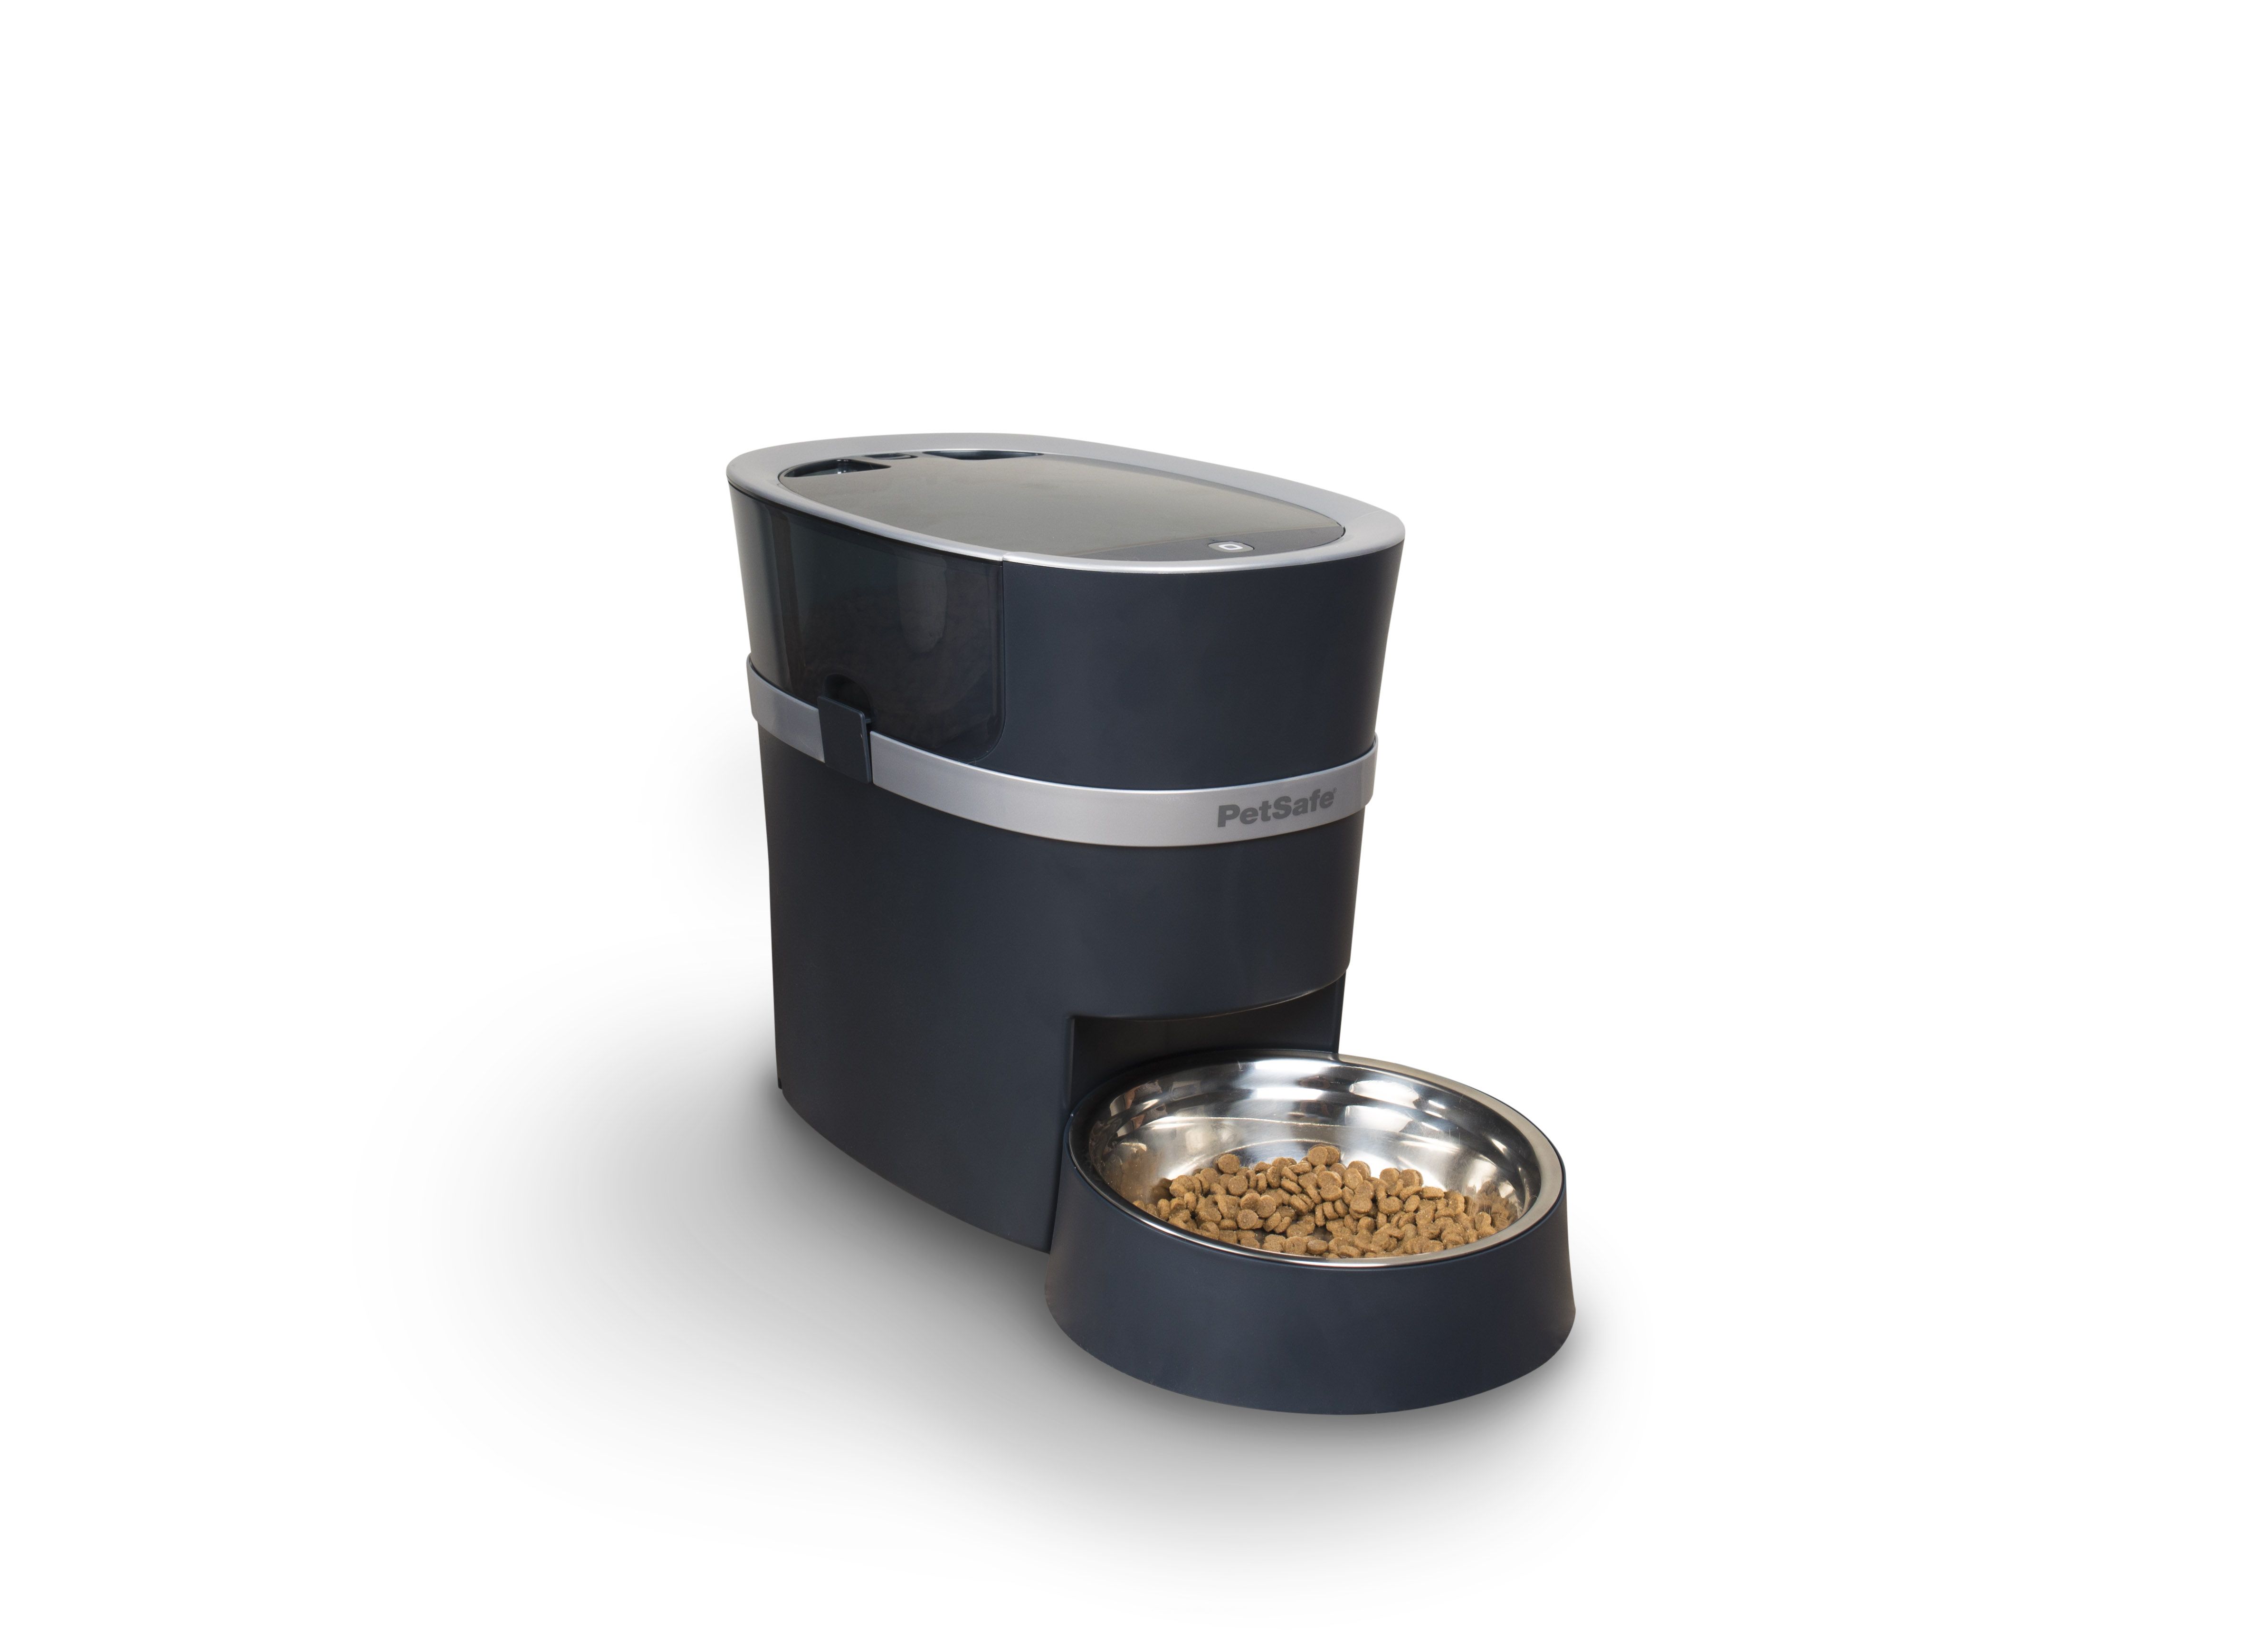 PetSafe Smart Feed Automatic Pet Feeder Makes Ellen's List